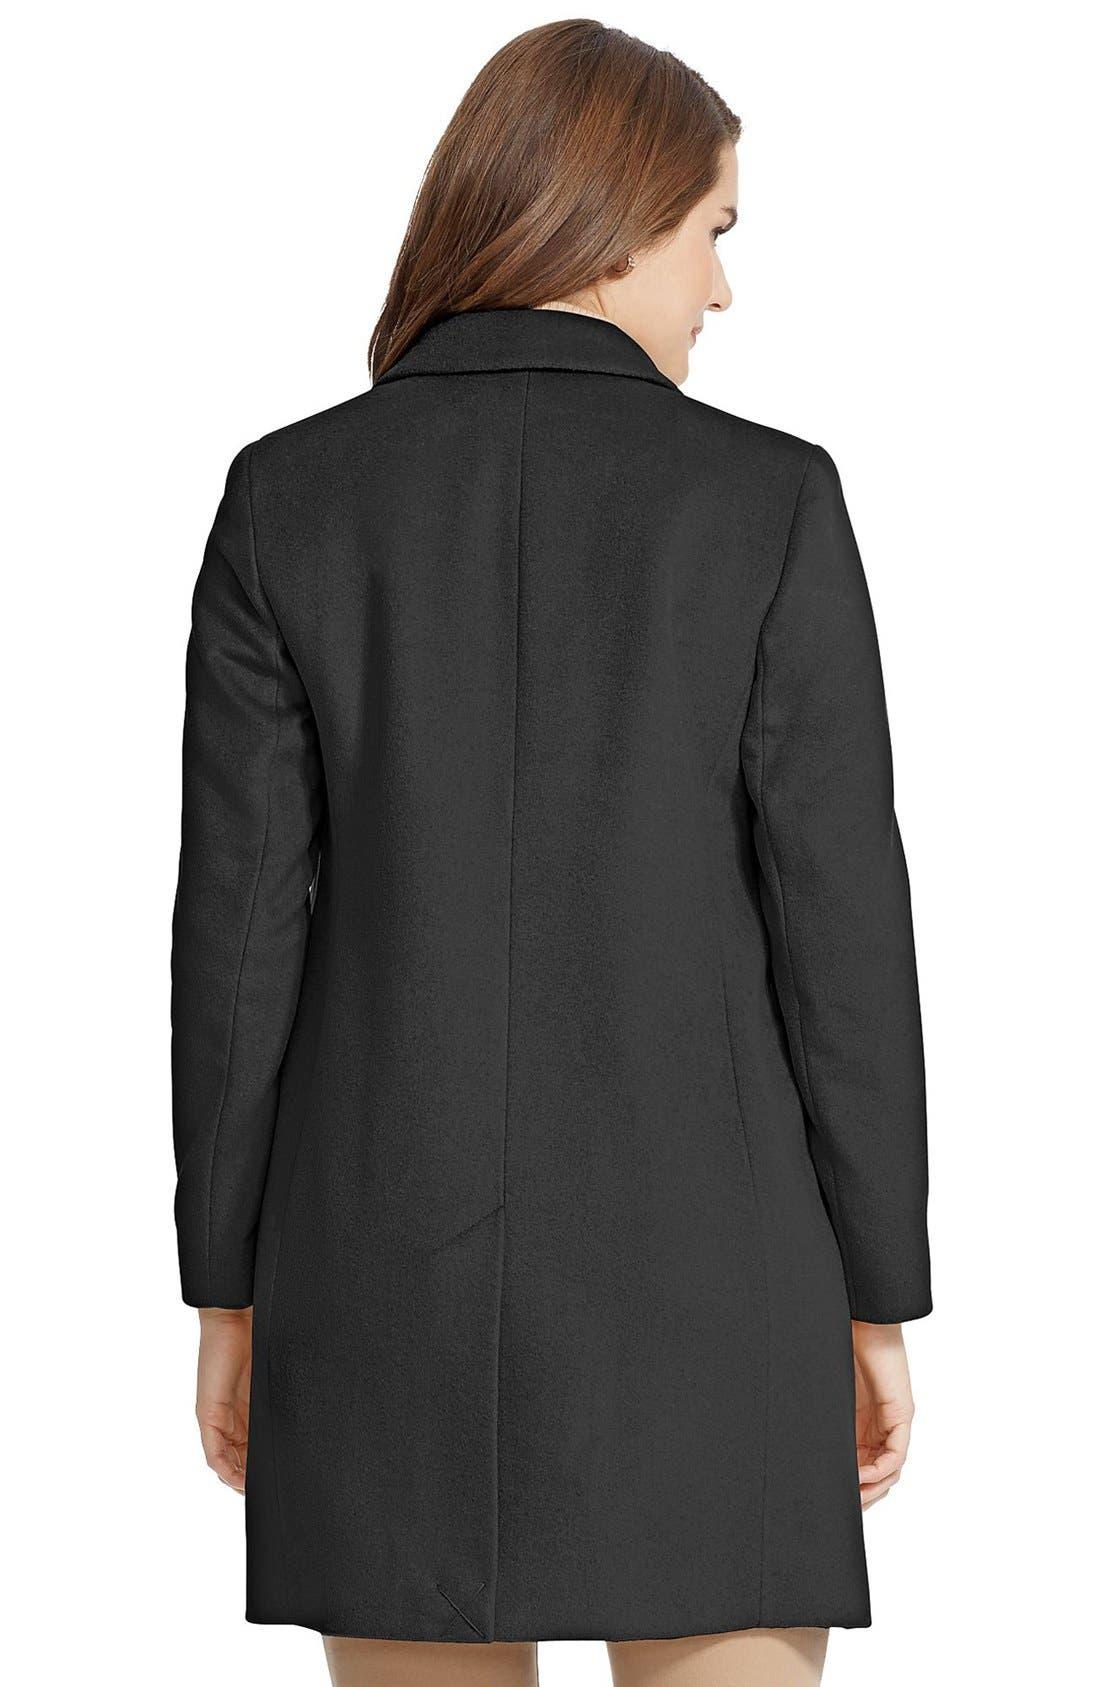 LAUREN RALPH LAUREN,                             Wool Blend Reefer Coat,                             Alternate thumbnail 2, color,                             BLACK